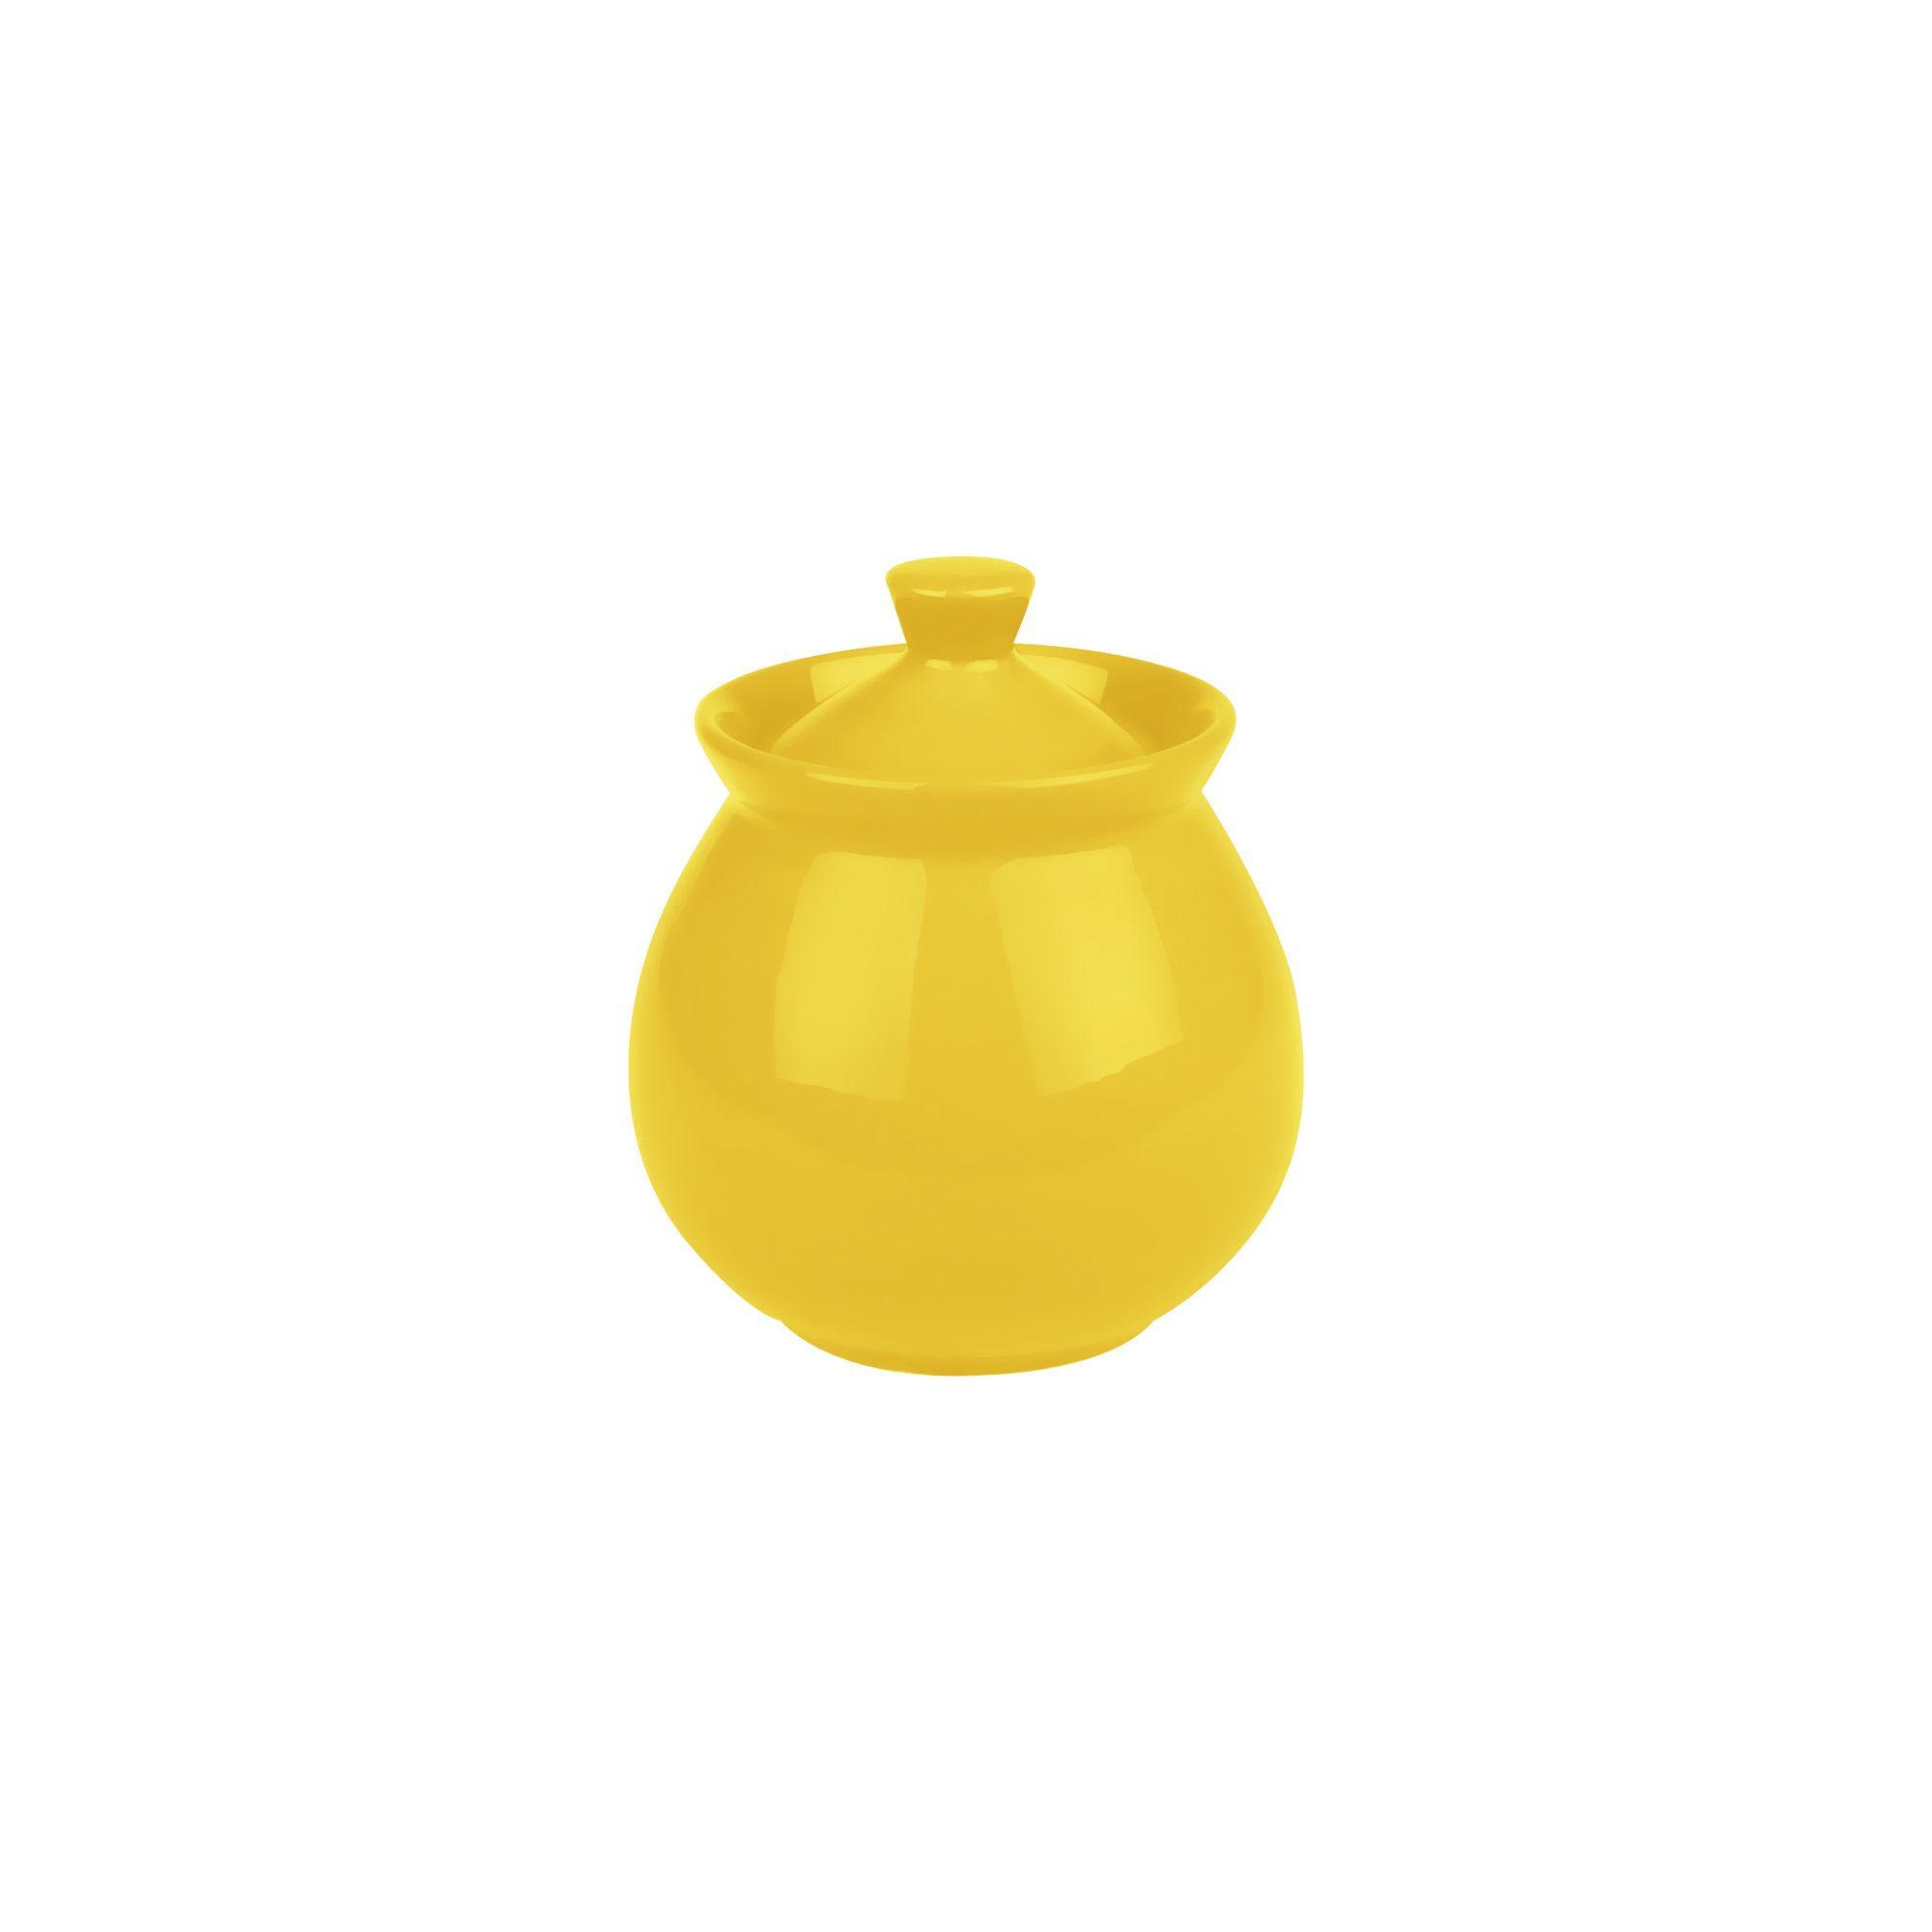 Yellow sugar bowls with lids - Waechtersbach Fun Factory Sugar Bowl With Lid In Yellow